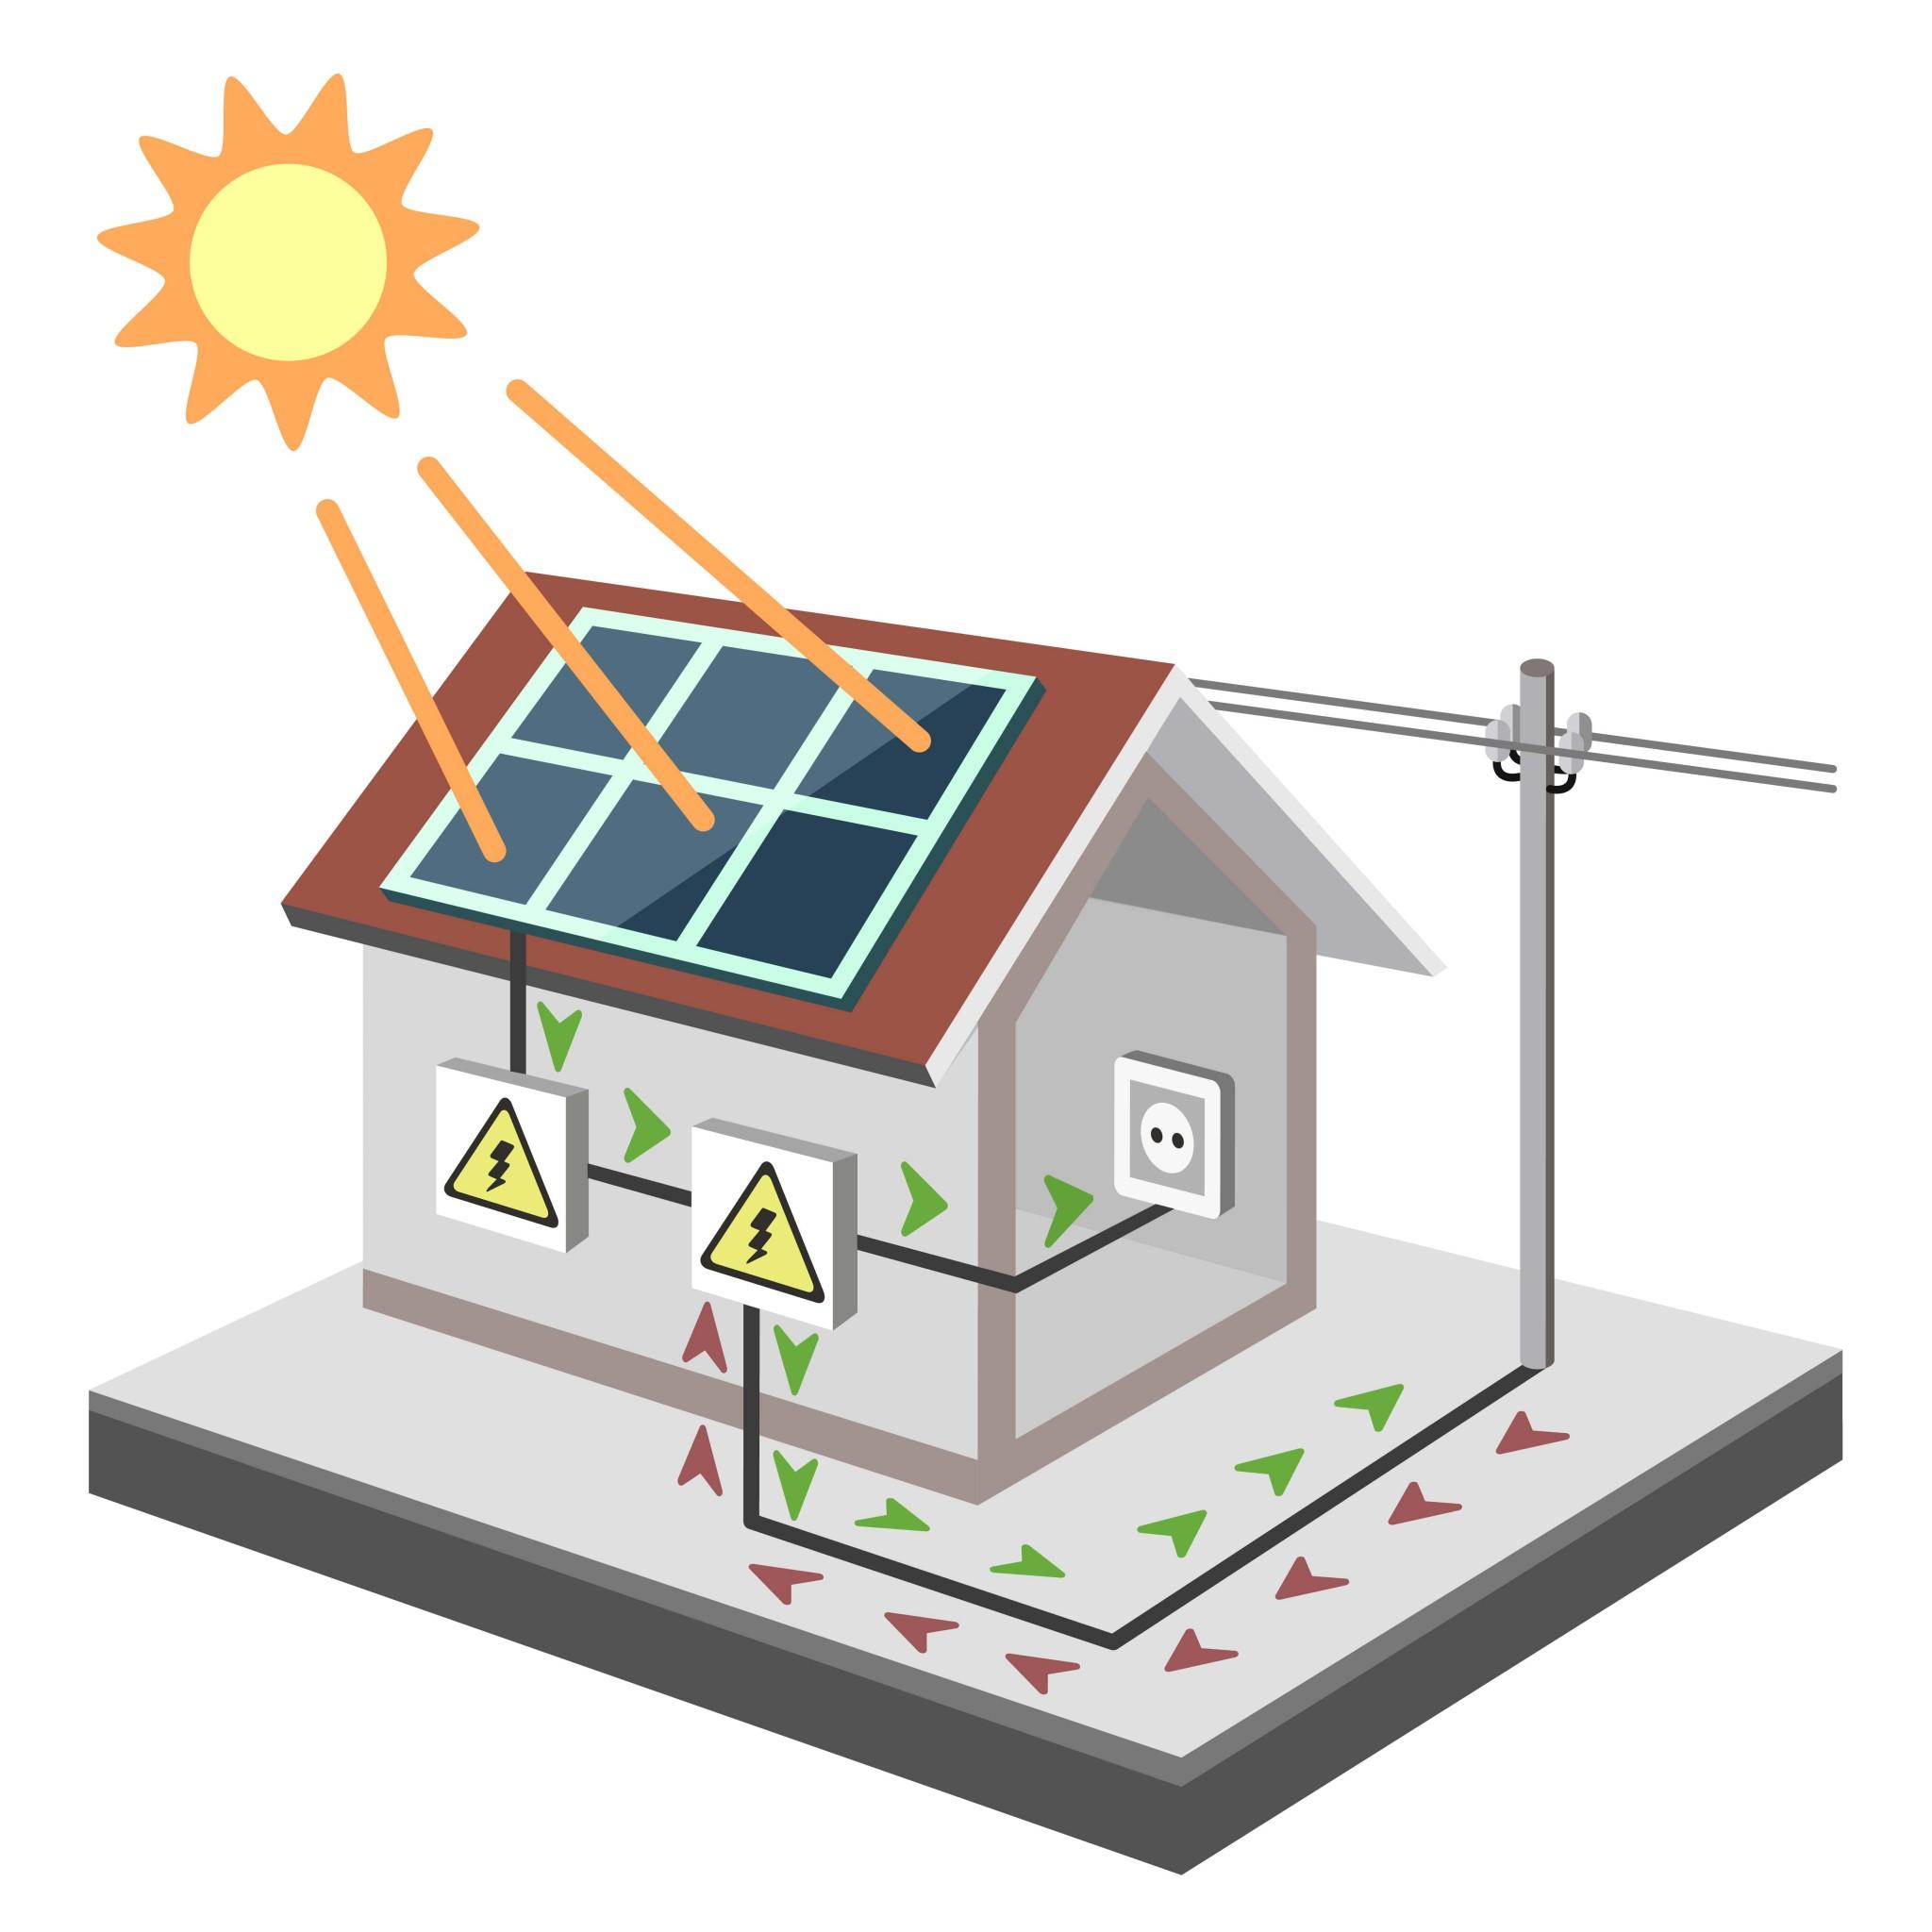 sistema fotovoltaico conectado à rede